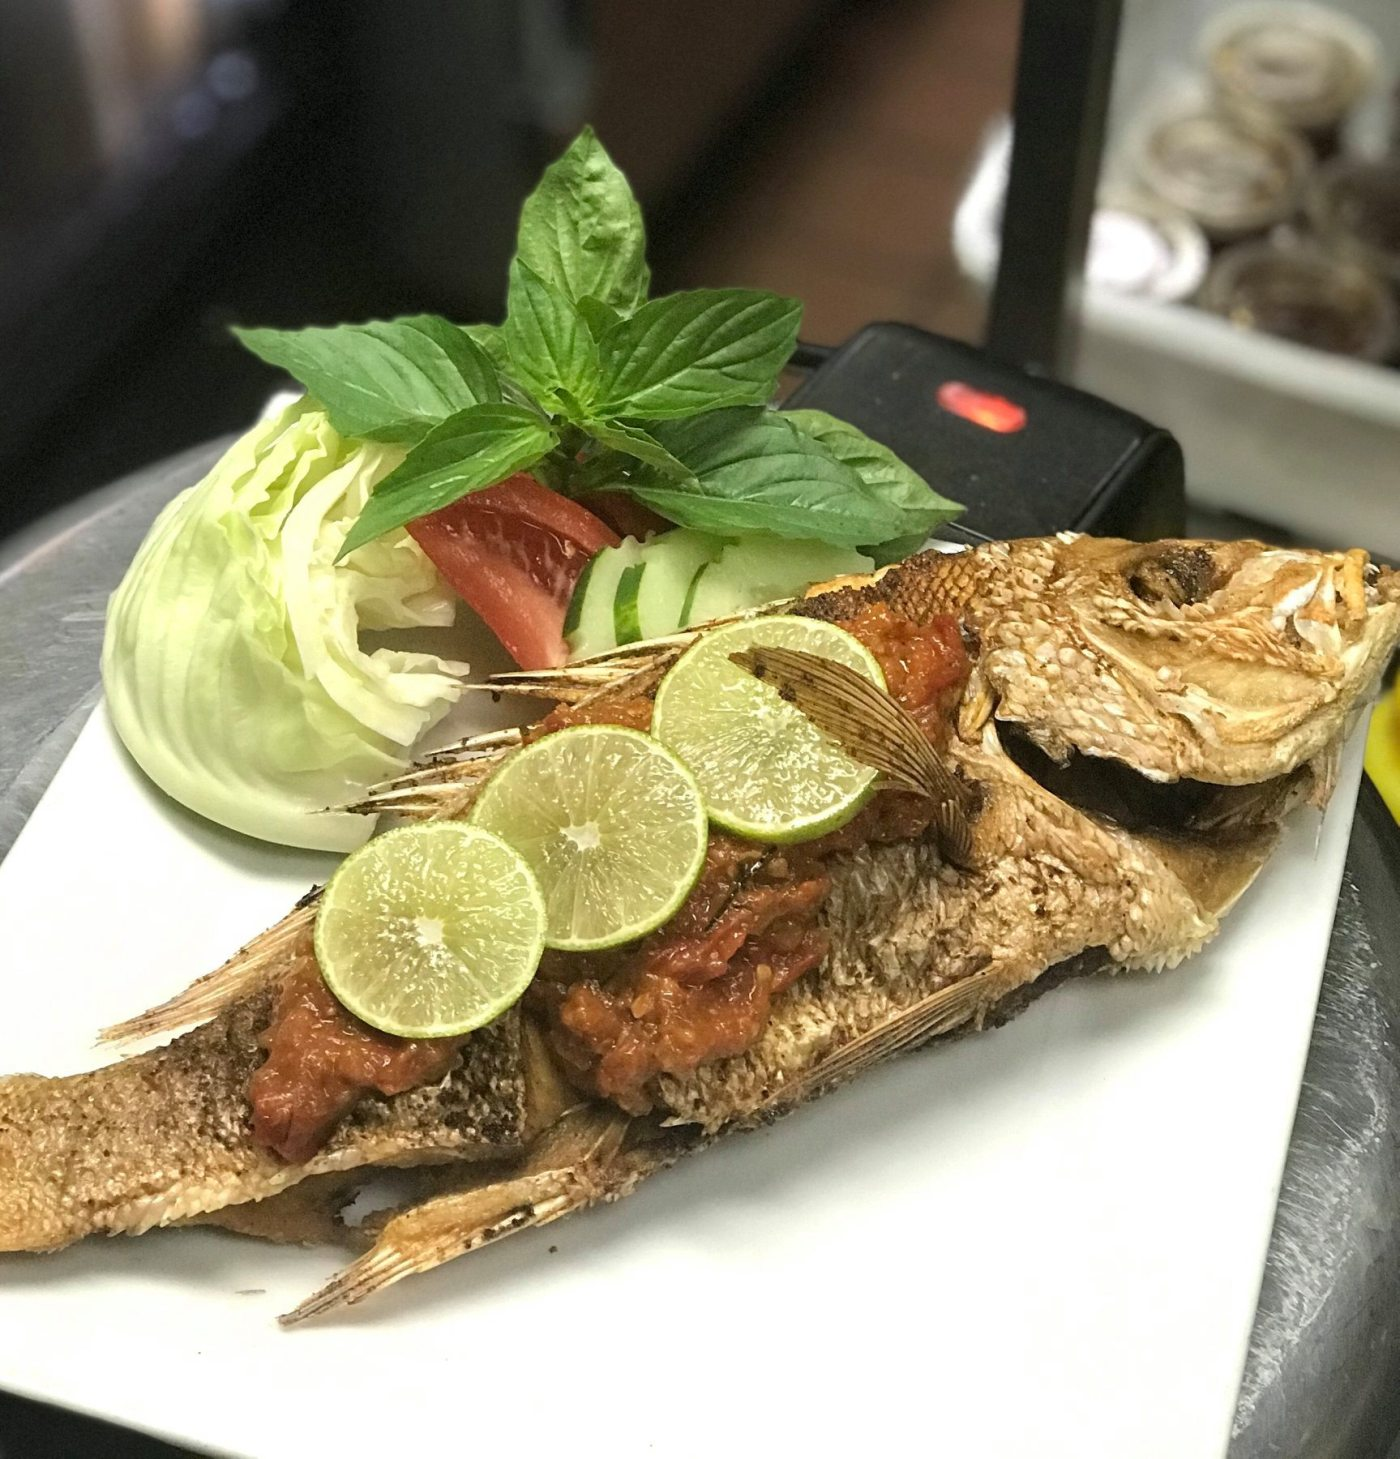 Indonesian food at Nori Thai and Sushi on the #secretmenu